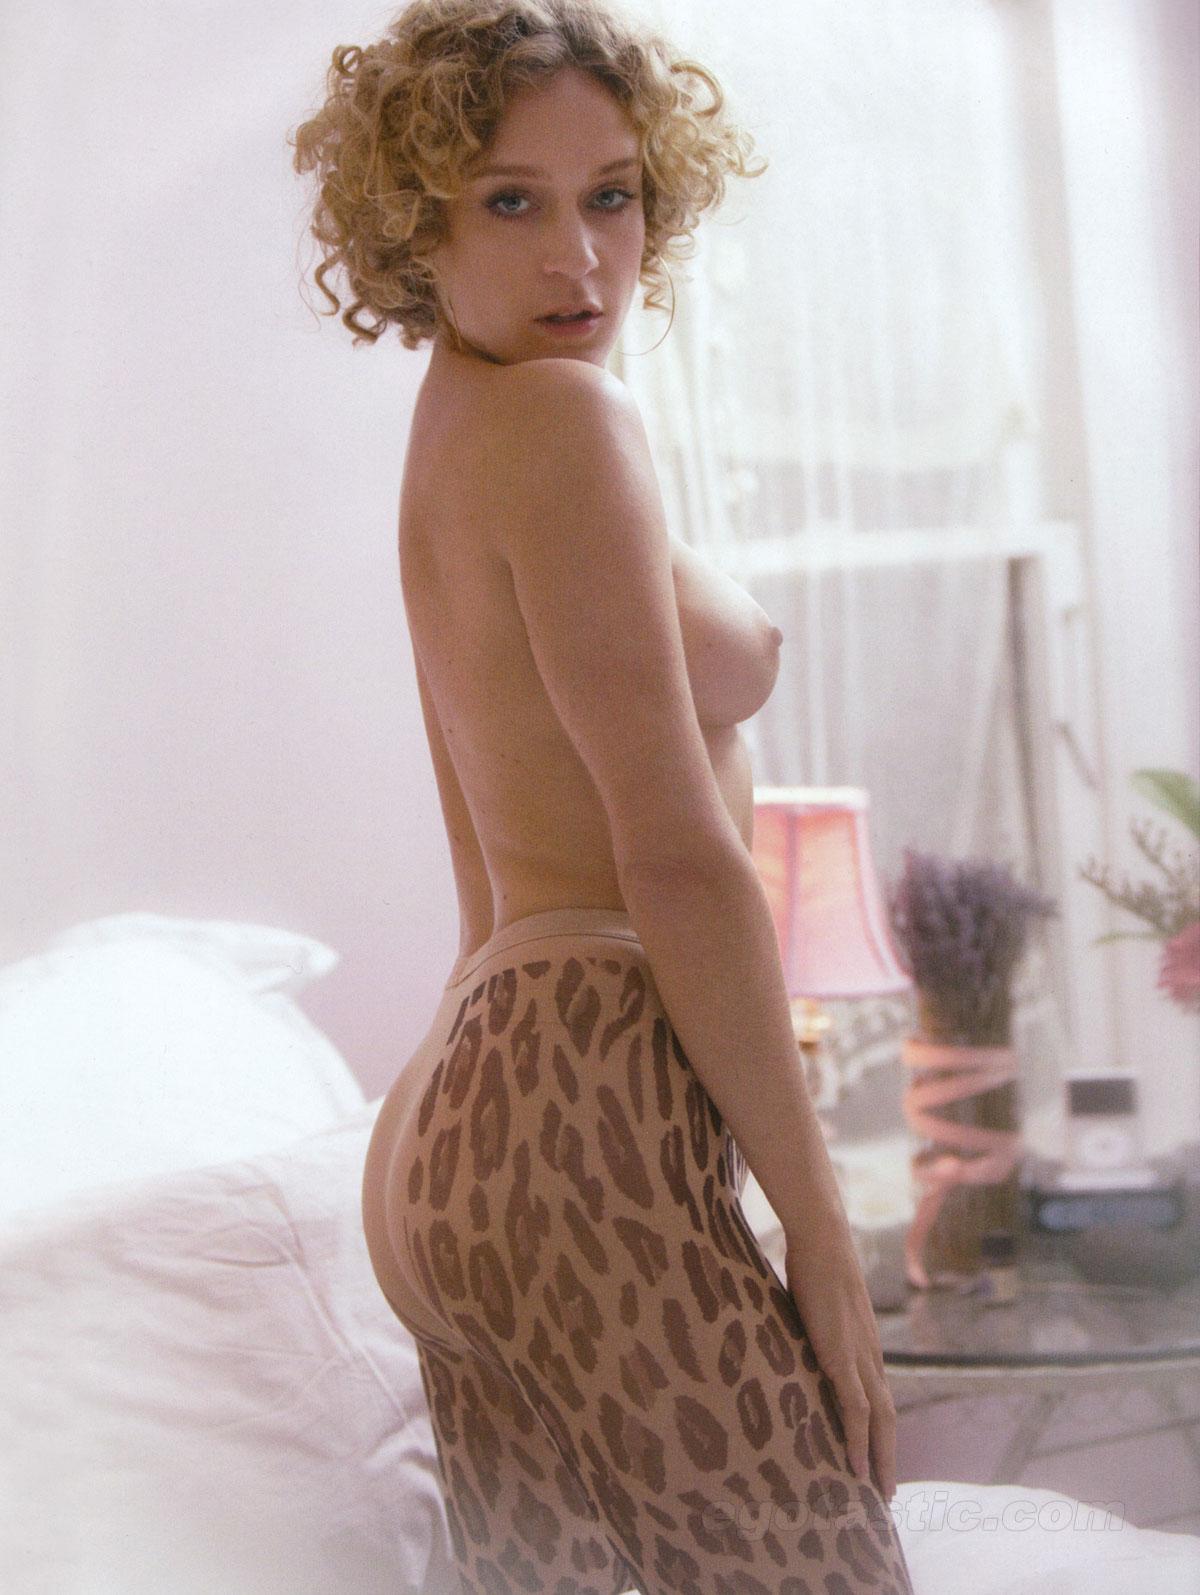 http://2.bp.blogspot.com/-Ypgoj7_0wRQ/TYJ2Ng8vV1I/AAAAAAAAB3M/UzKgDy9hQEU/s1600/chloe-sevigny-topless-blast-mag-02.jpg